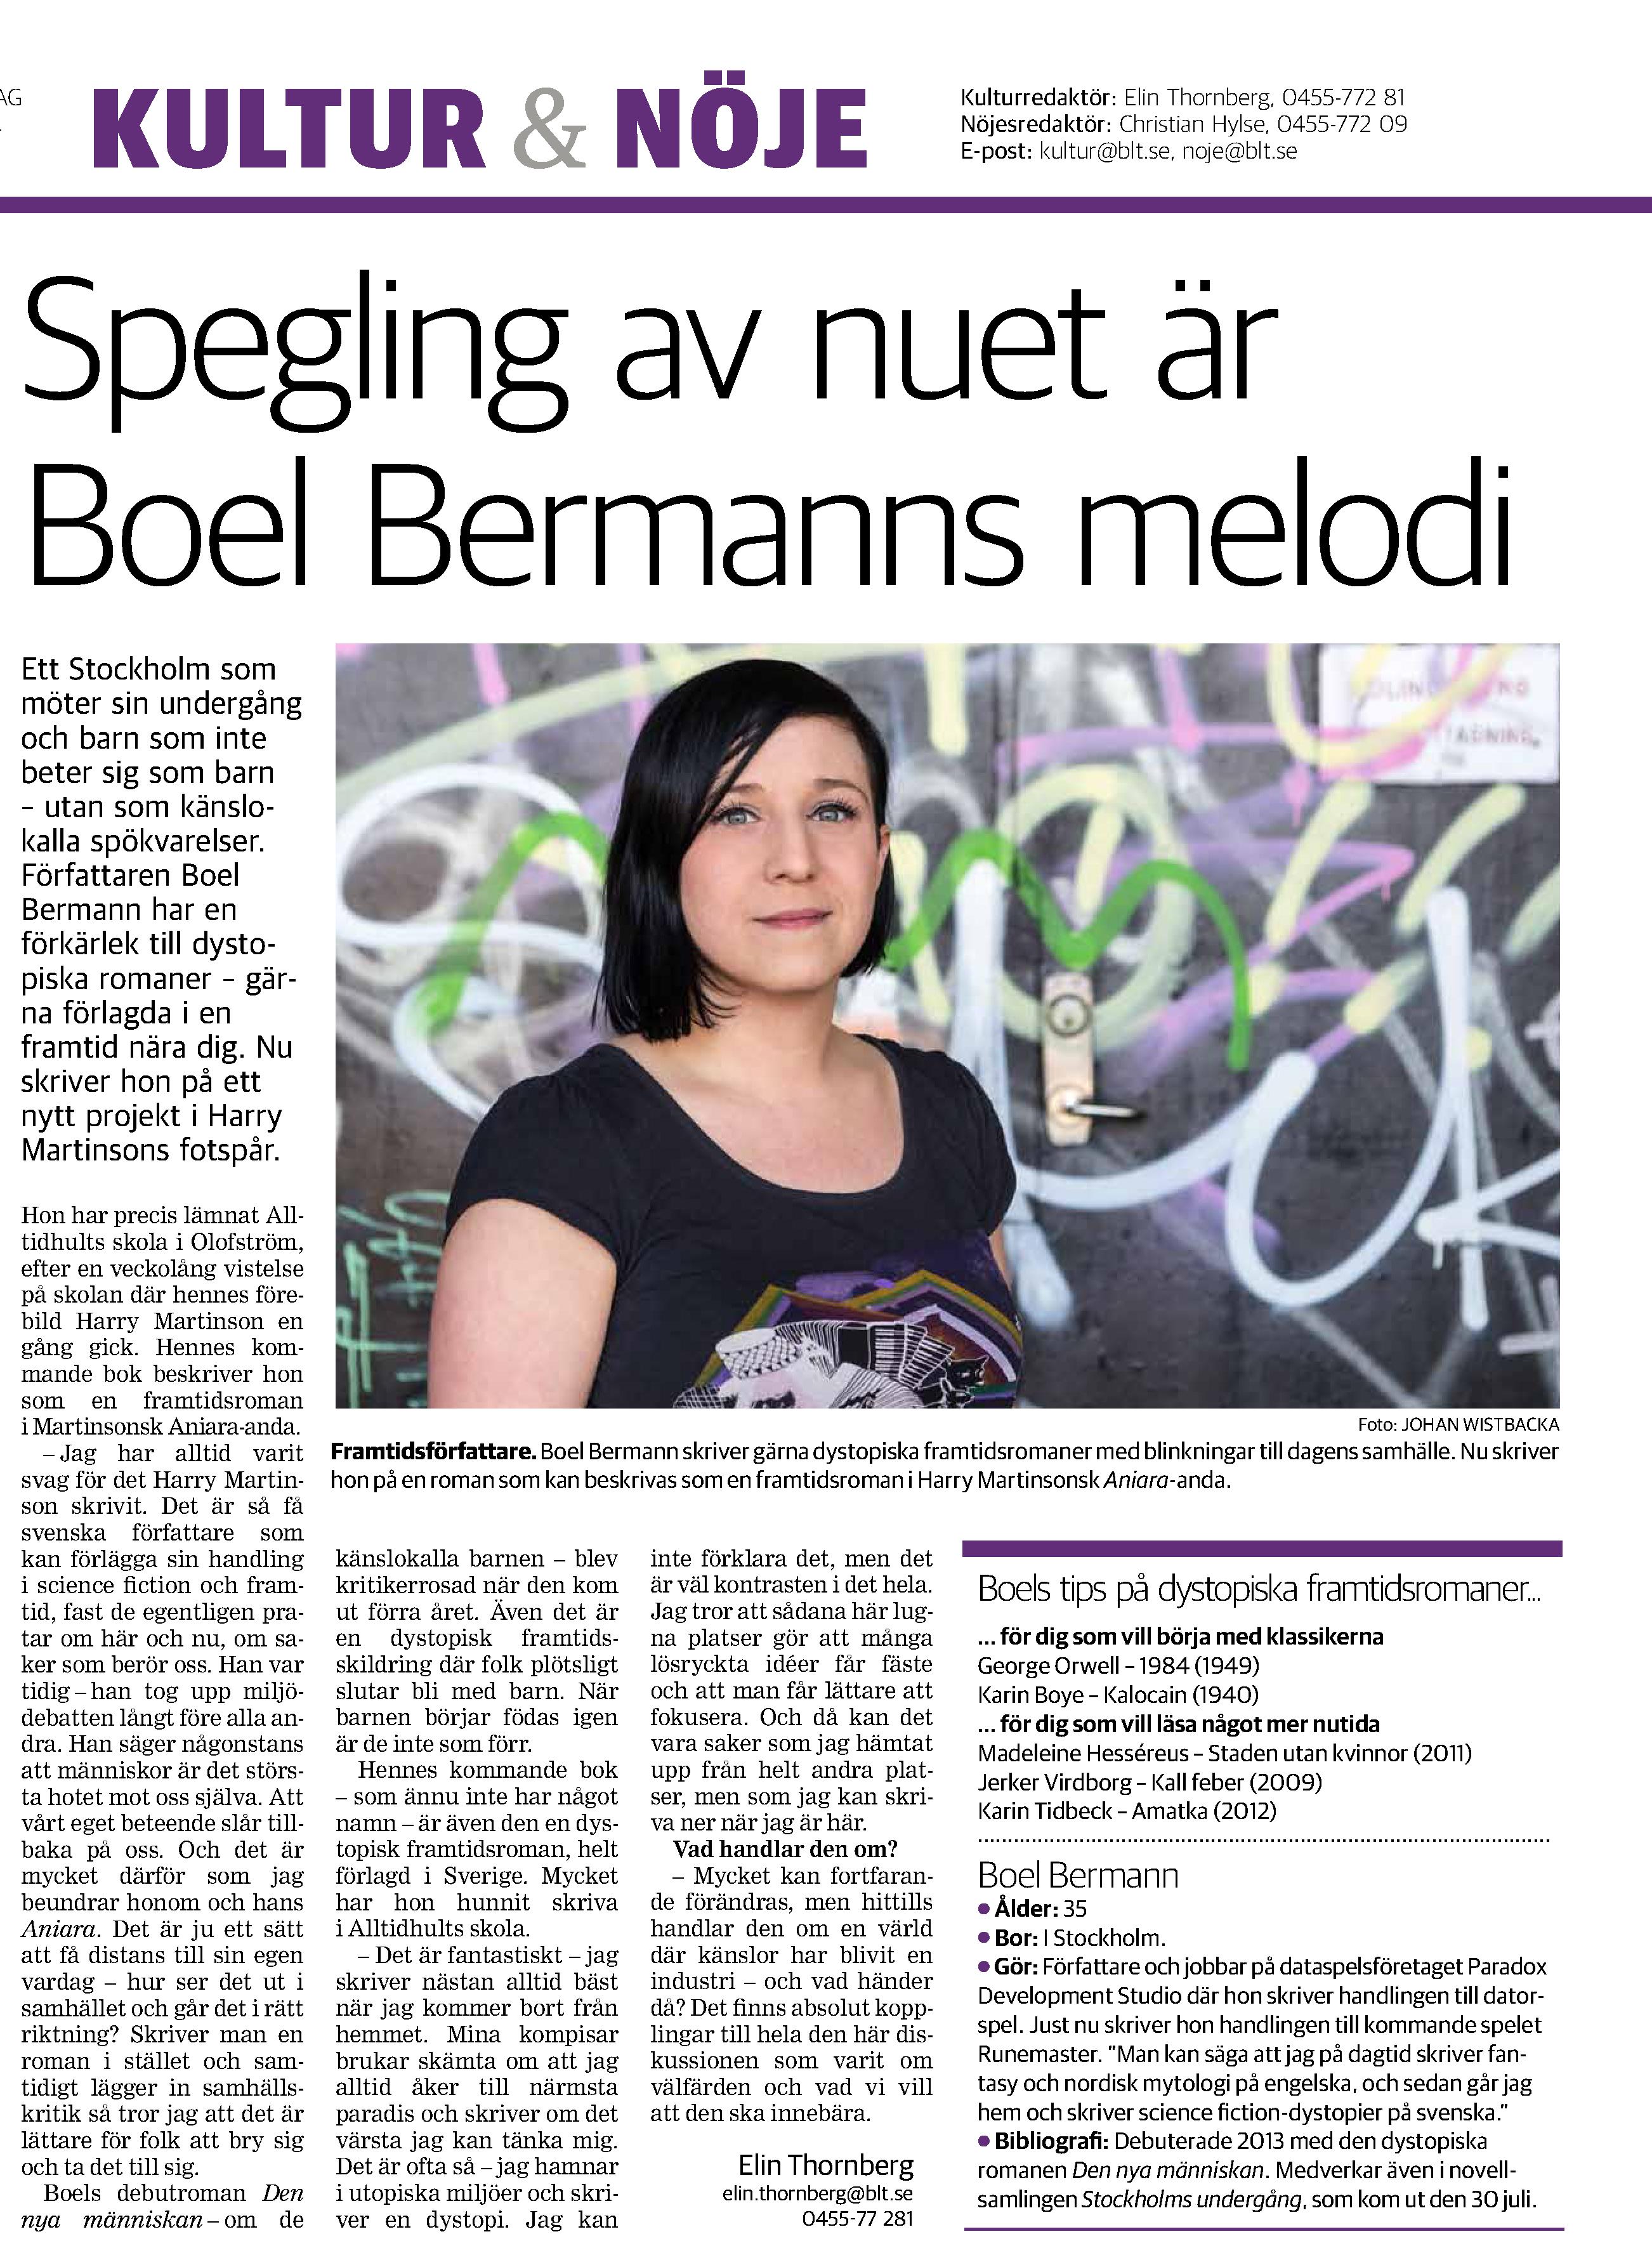 Blekinge Läns Tidning Kultur & Nöje - Intervju Boel Bermann